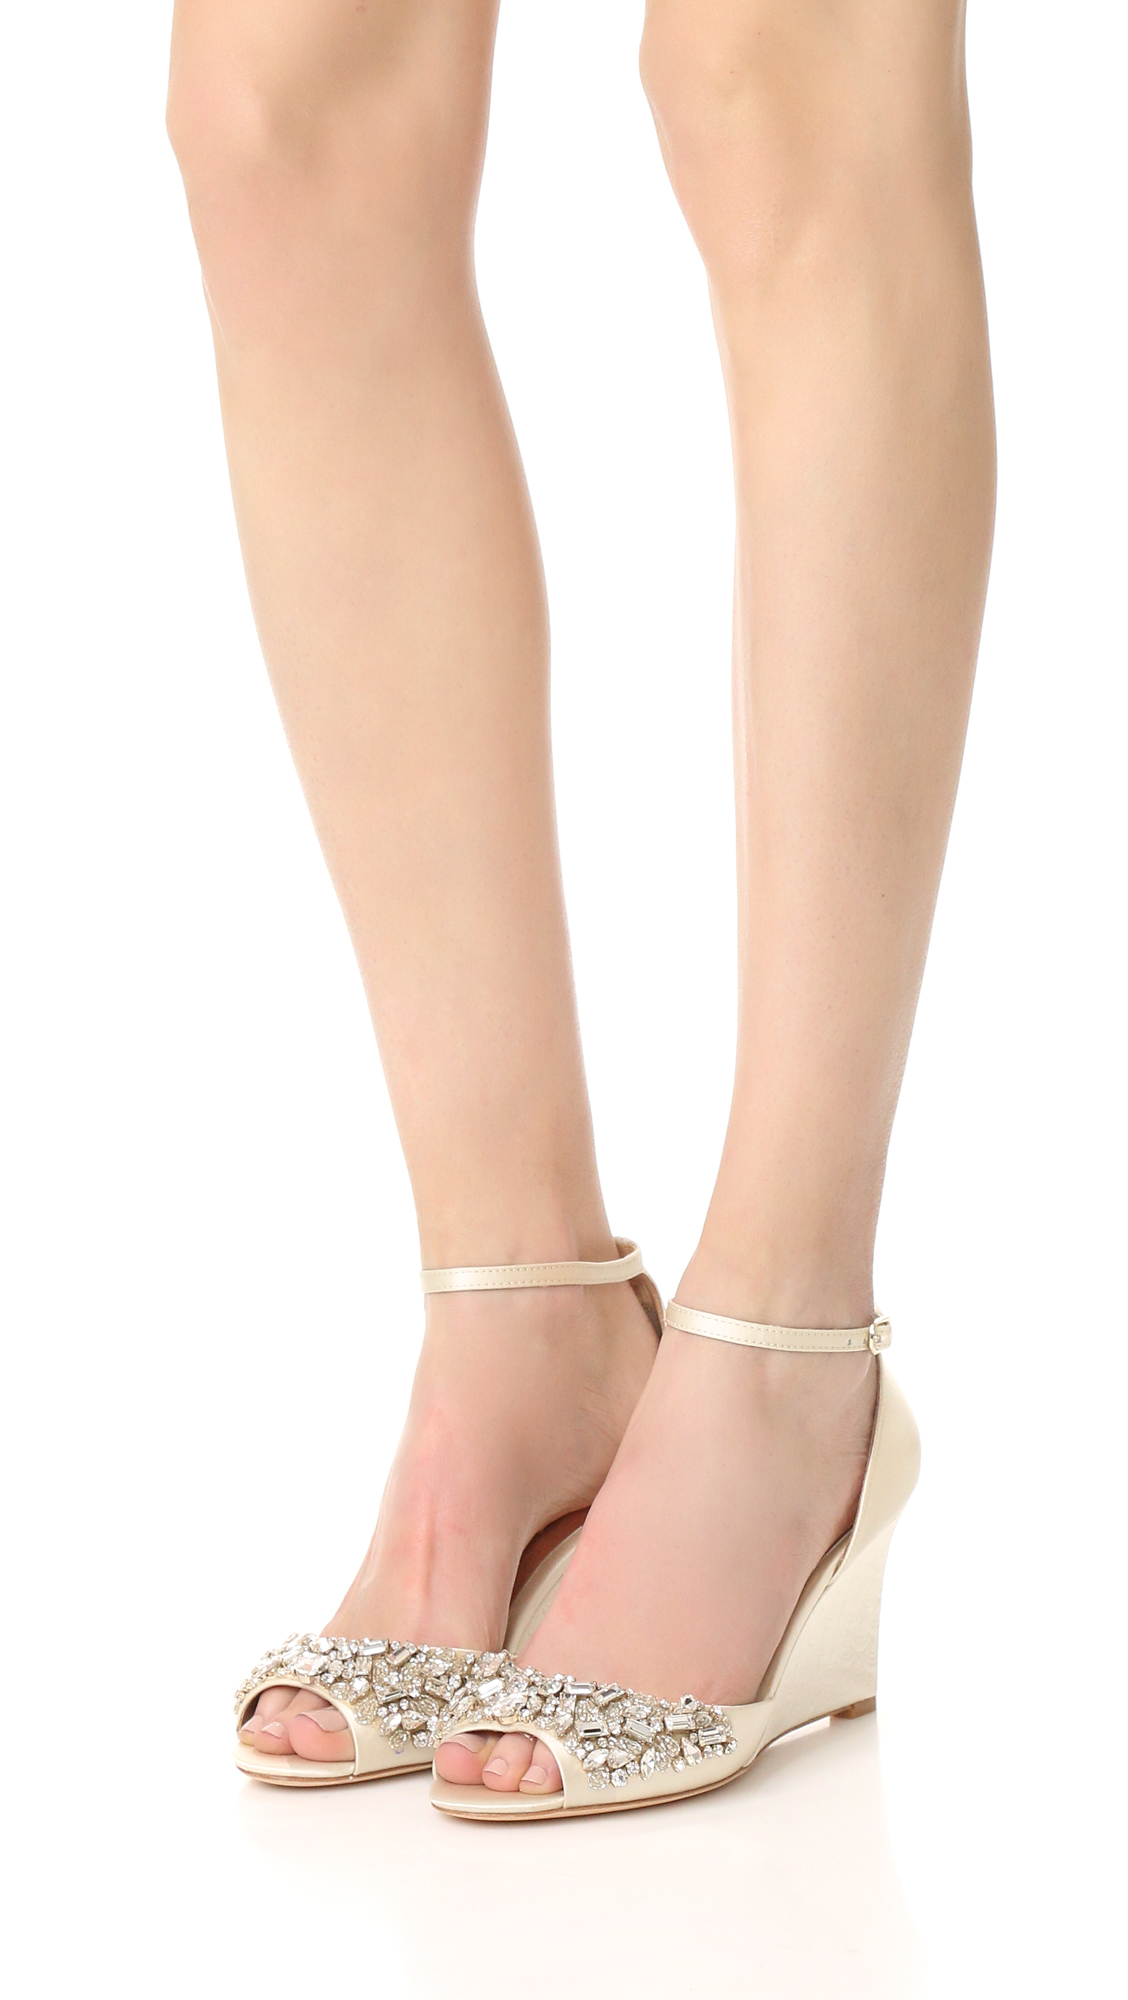 4257b77bdd9 Badgley Mischka Barbara Wedge Sandals